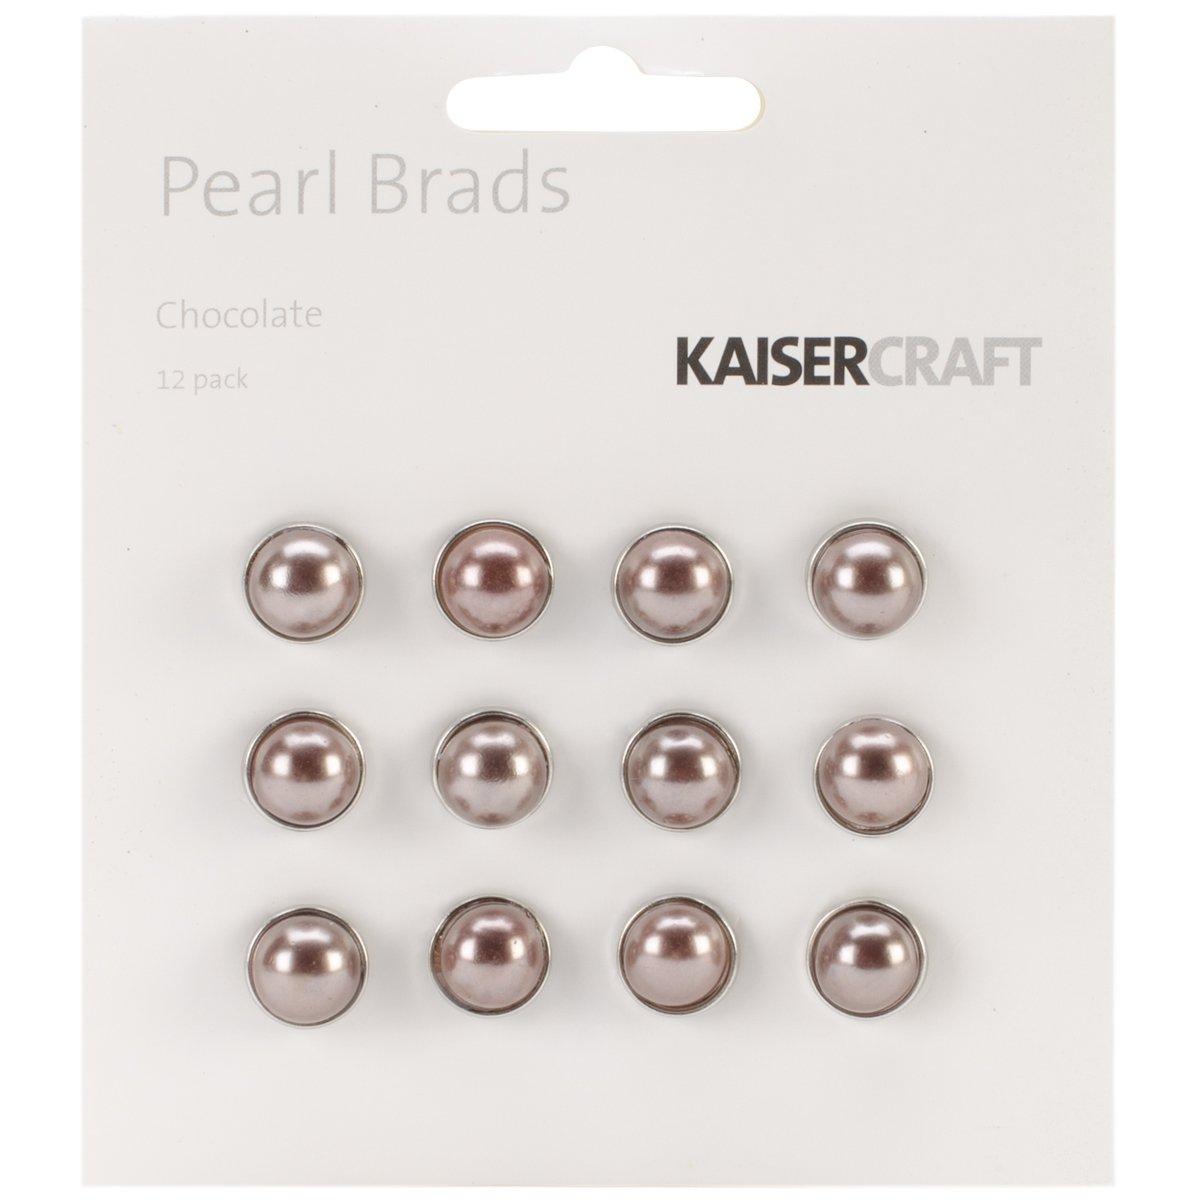 Confetti Clear Clear Clear Stamps 6.25 X4  (16cm X 10cm)- B00GZ8E2C8 | Good Design  | Niedrige Kosten  | ein guter Ruf in der Welt  7e908f